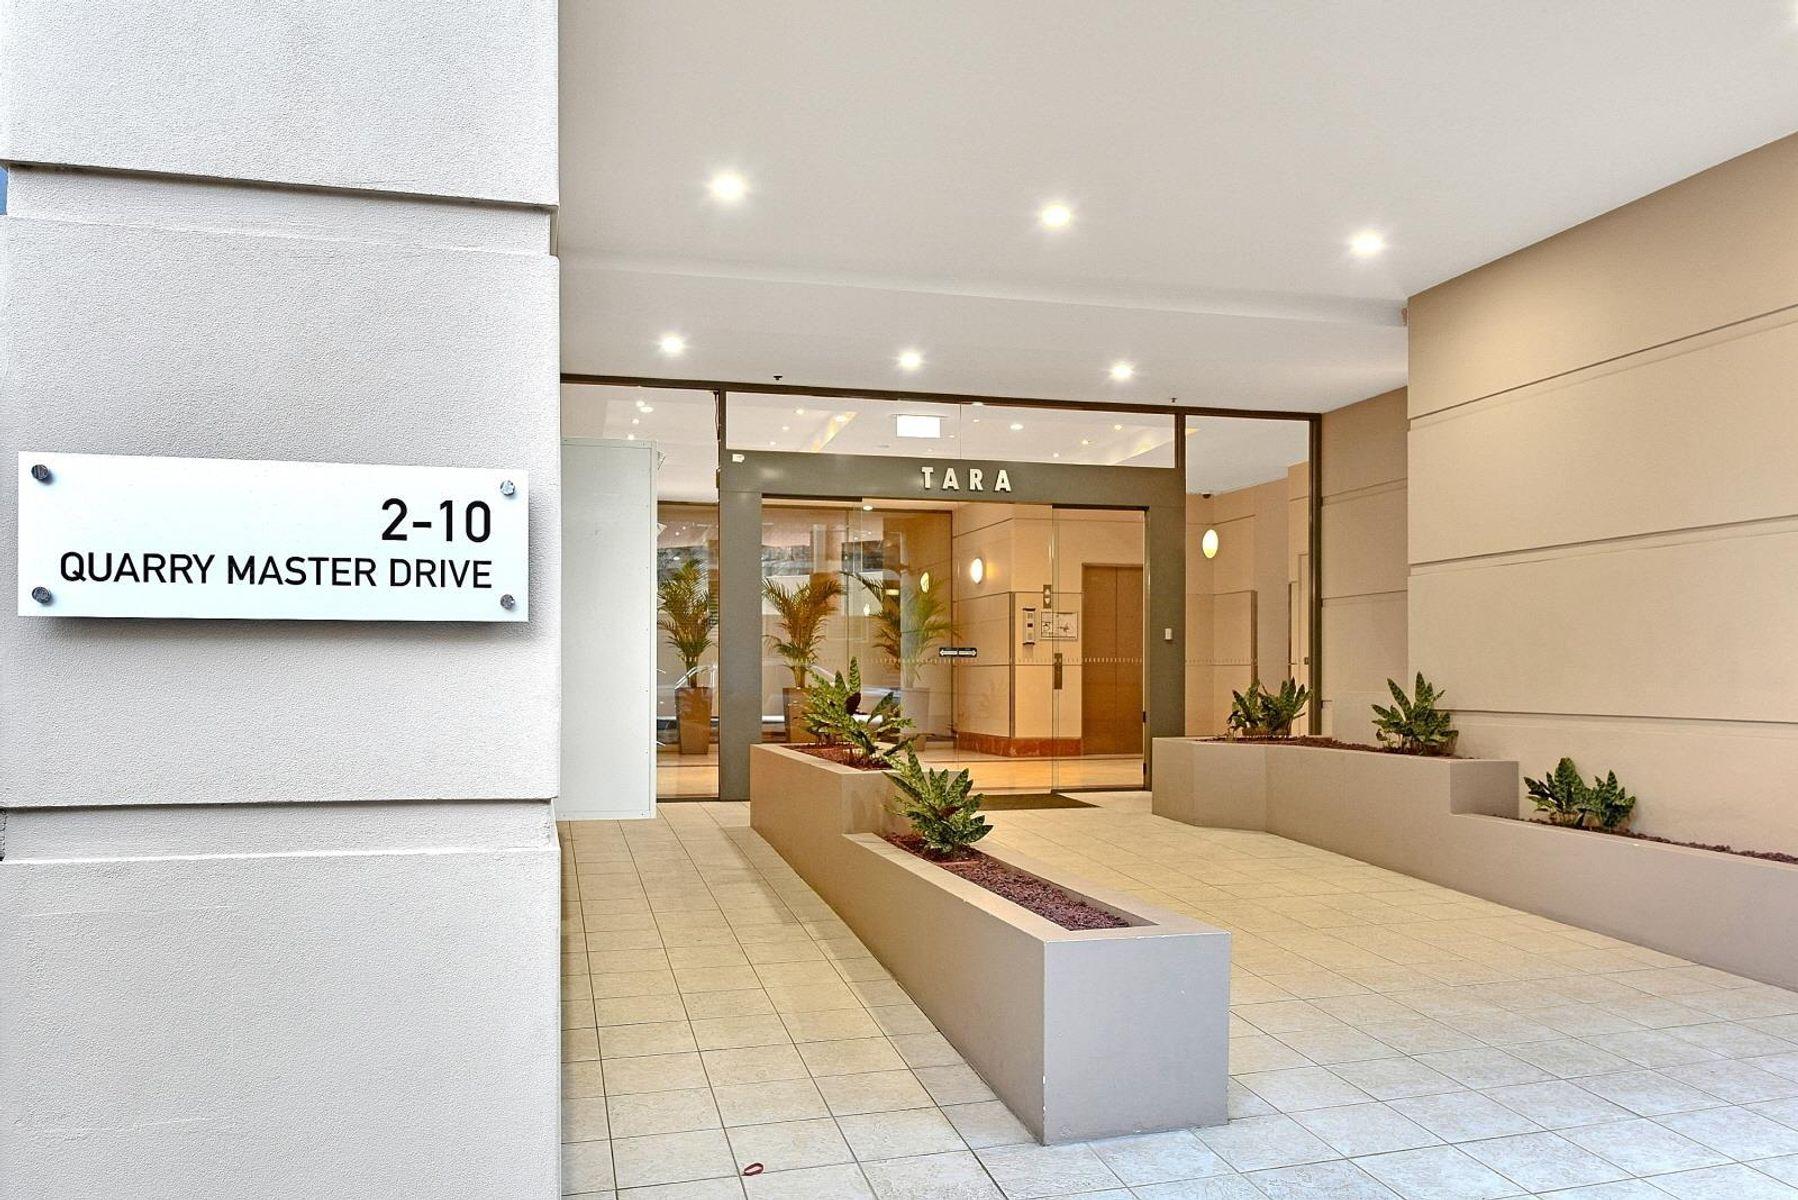 17/2-10 Quarry Master Drive, Pyrmont, NSW 2009